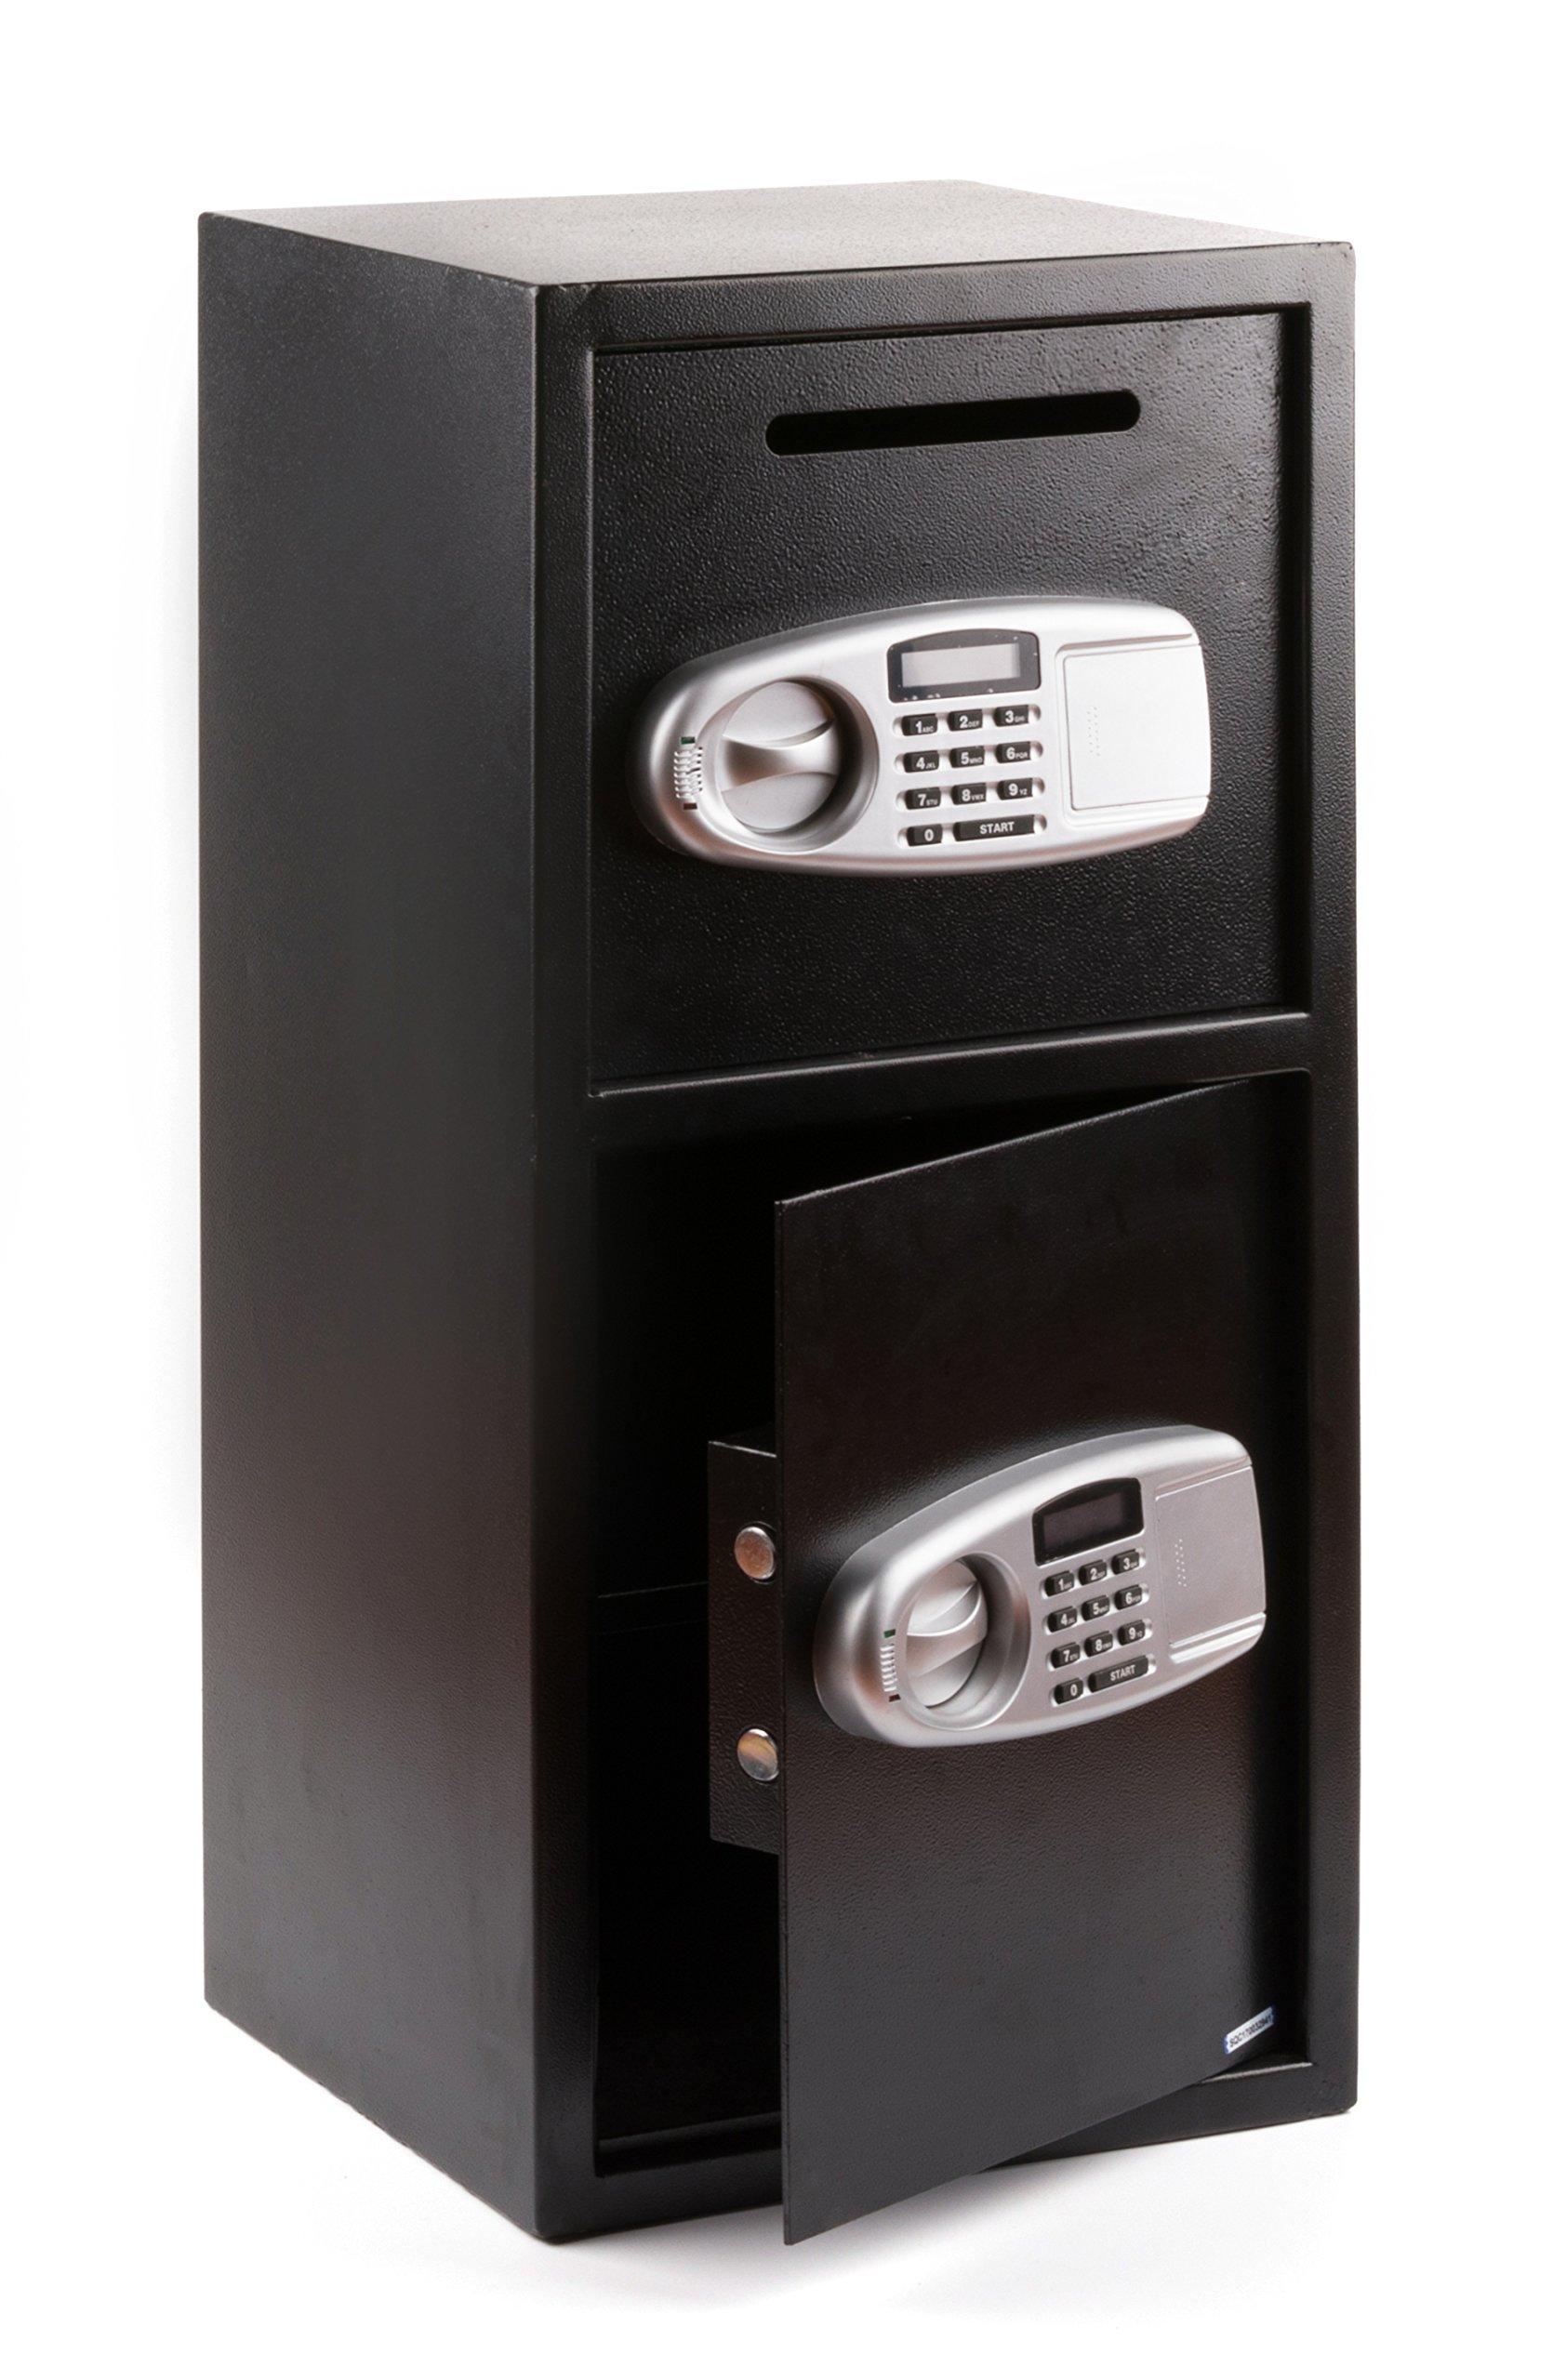 Windaze Large Safe Box Double Door Digital Depository Drop Box Security Lock for Gun Cash Valuable Storage, 3.04 Cubic Feet